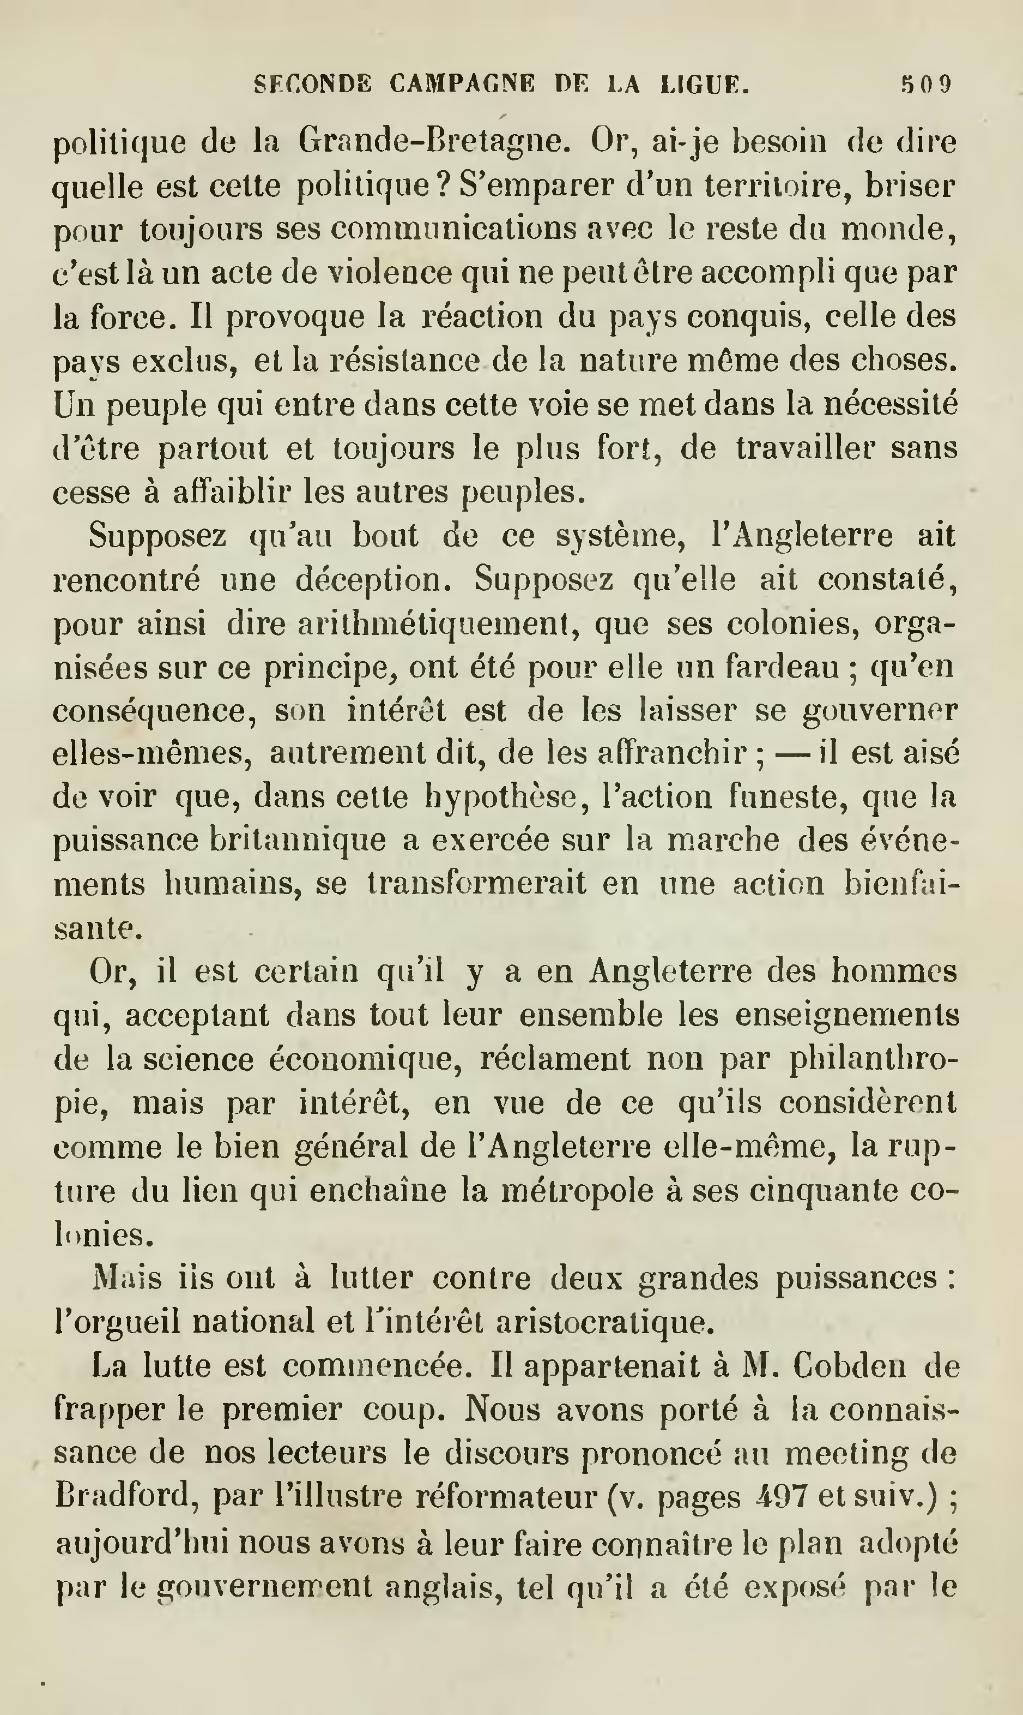 Page œuvres Completes De Frederic Bastiat Guillaumin 3 Djvu 519